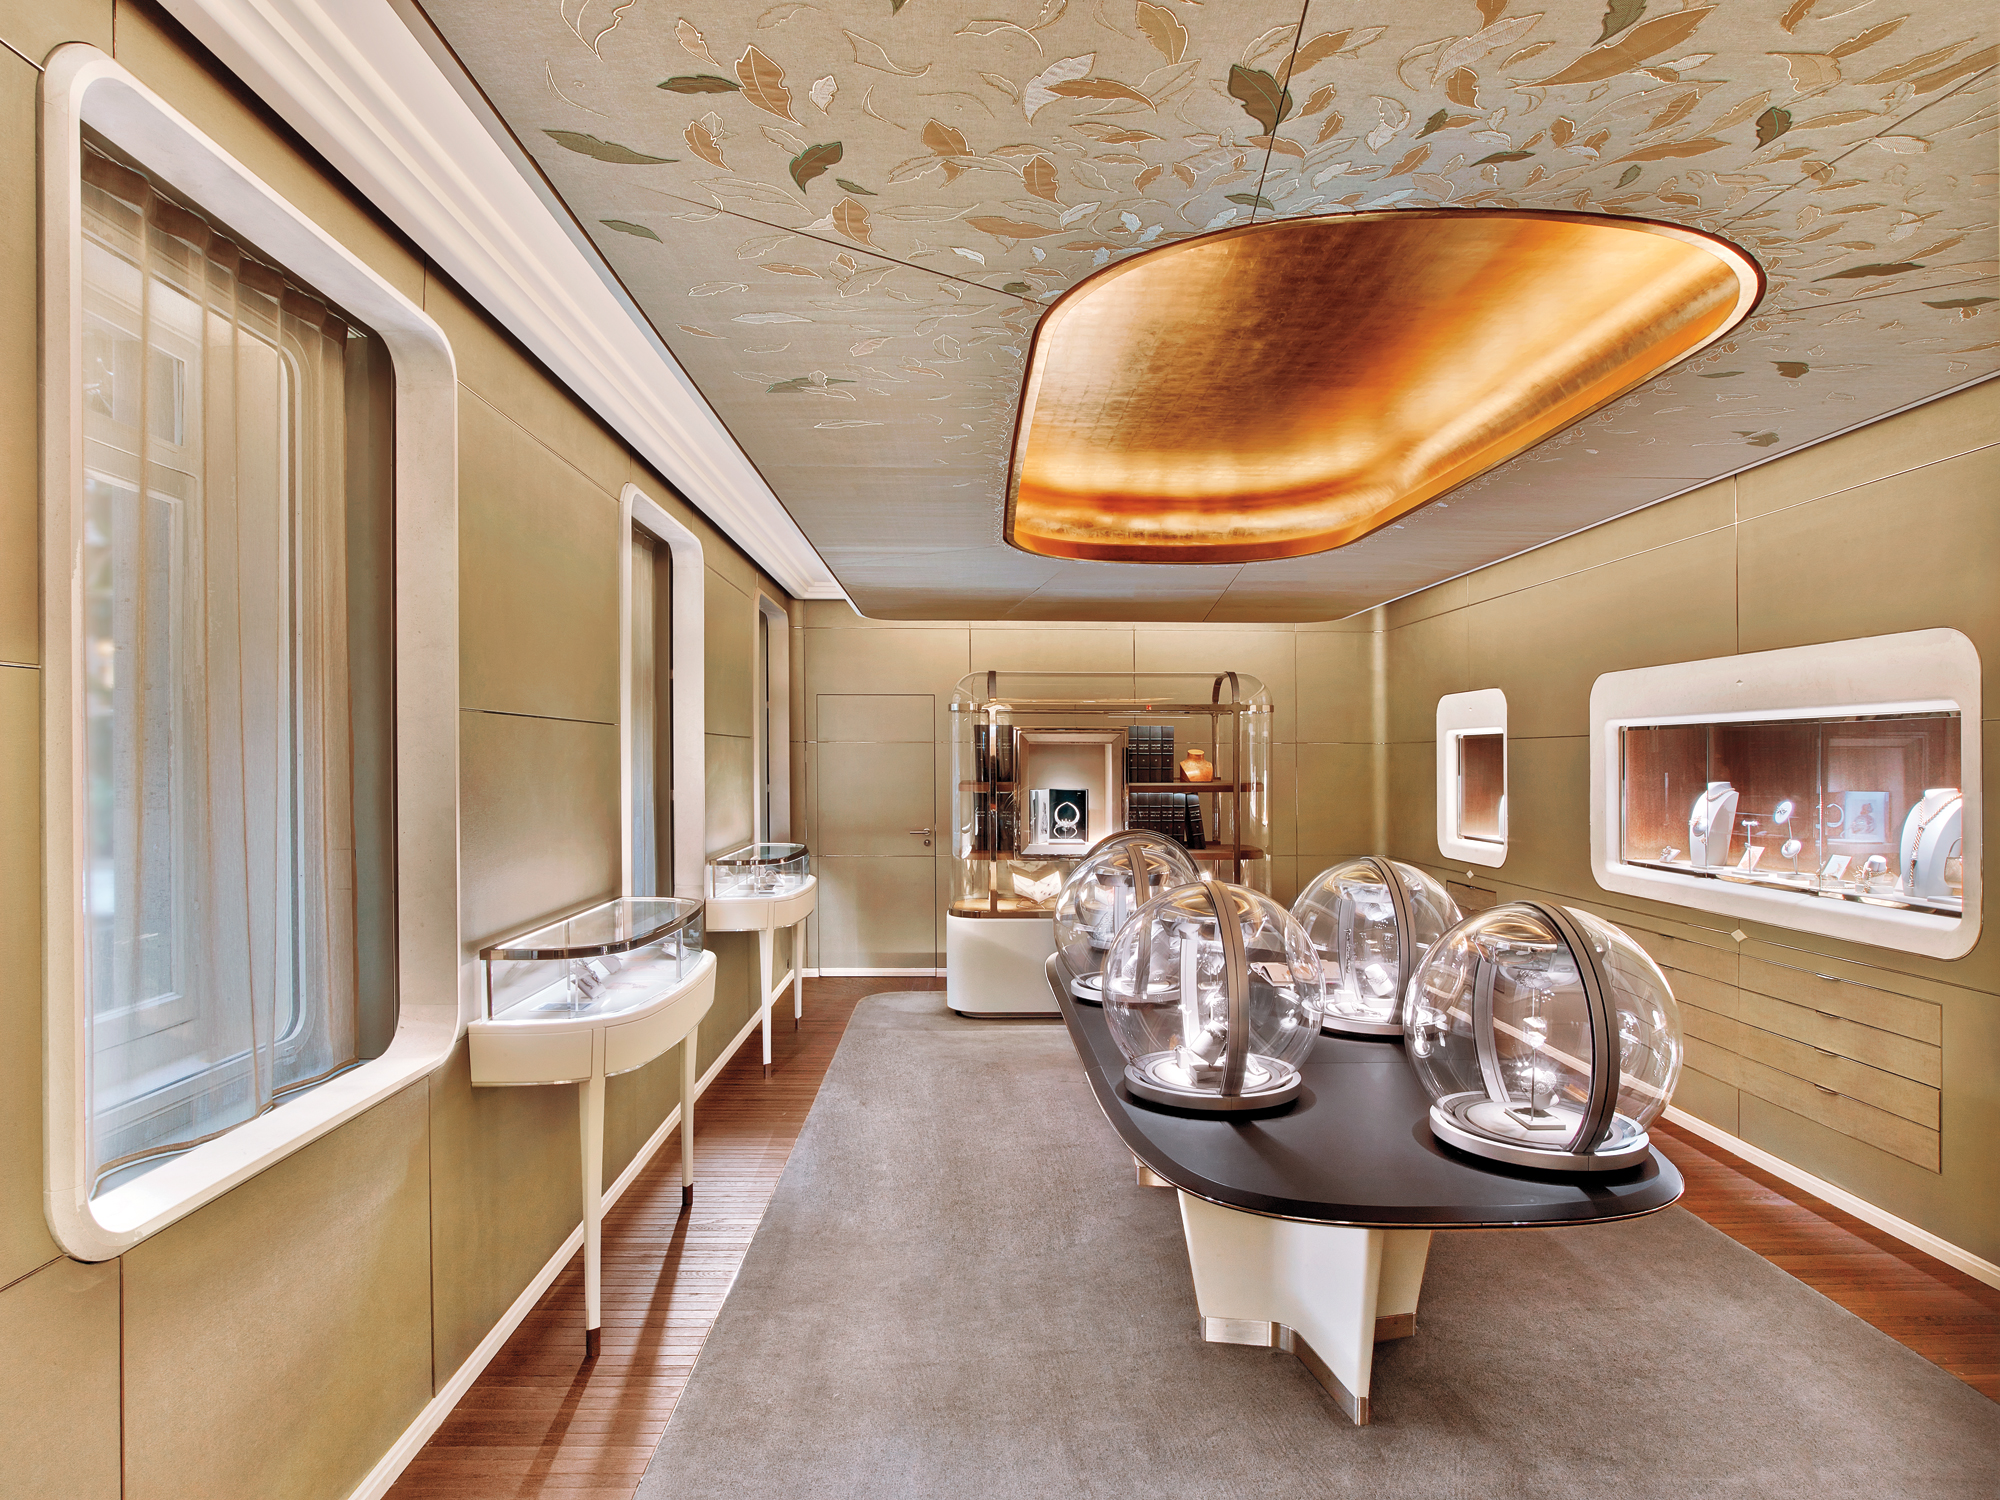 Van Cleef  Arpels by Jouin Manku 2016 Best of Year Winner for Jewelry Retail